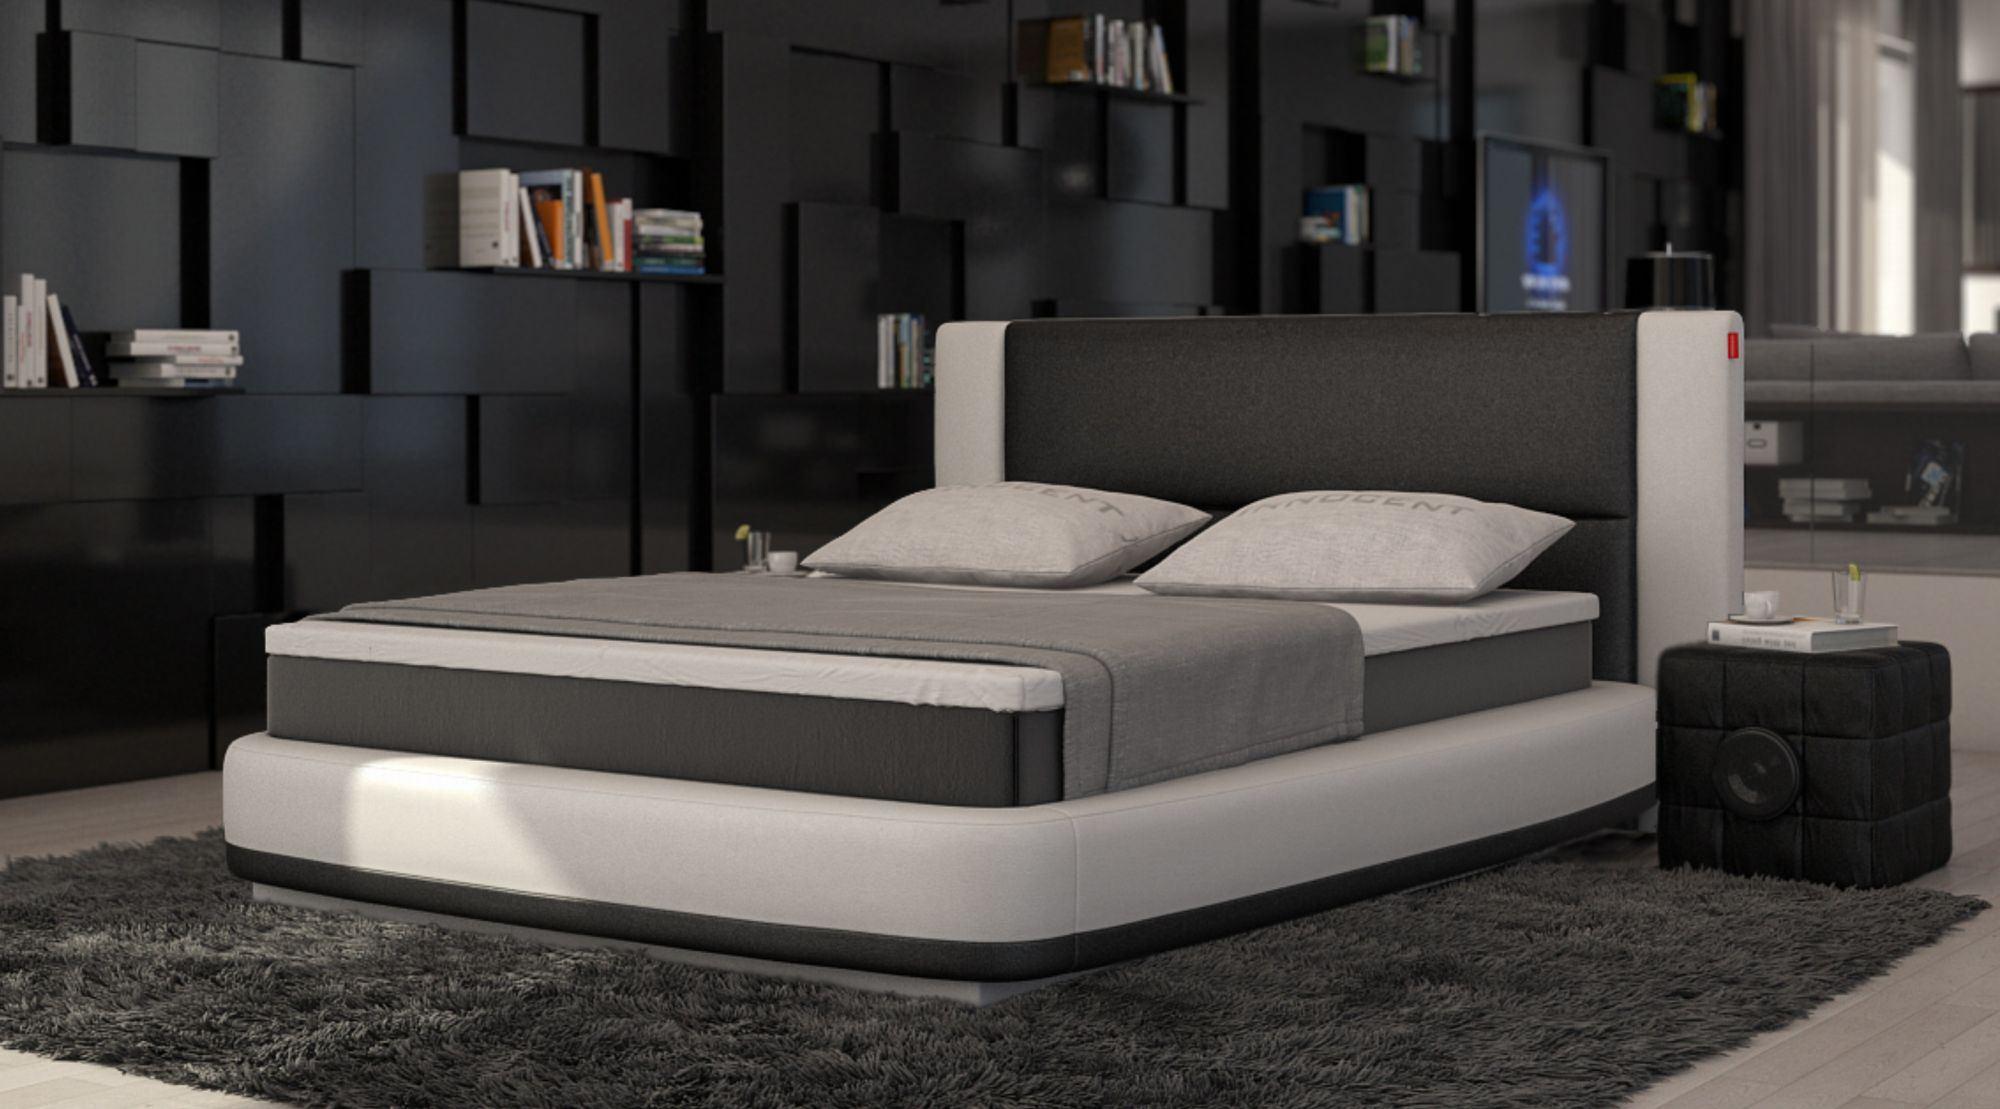 Boxspringbett AQUILA Design Luxus Polsterbett bequemes Designerbett Zweifarbig  eBay